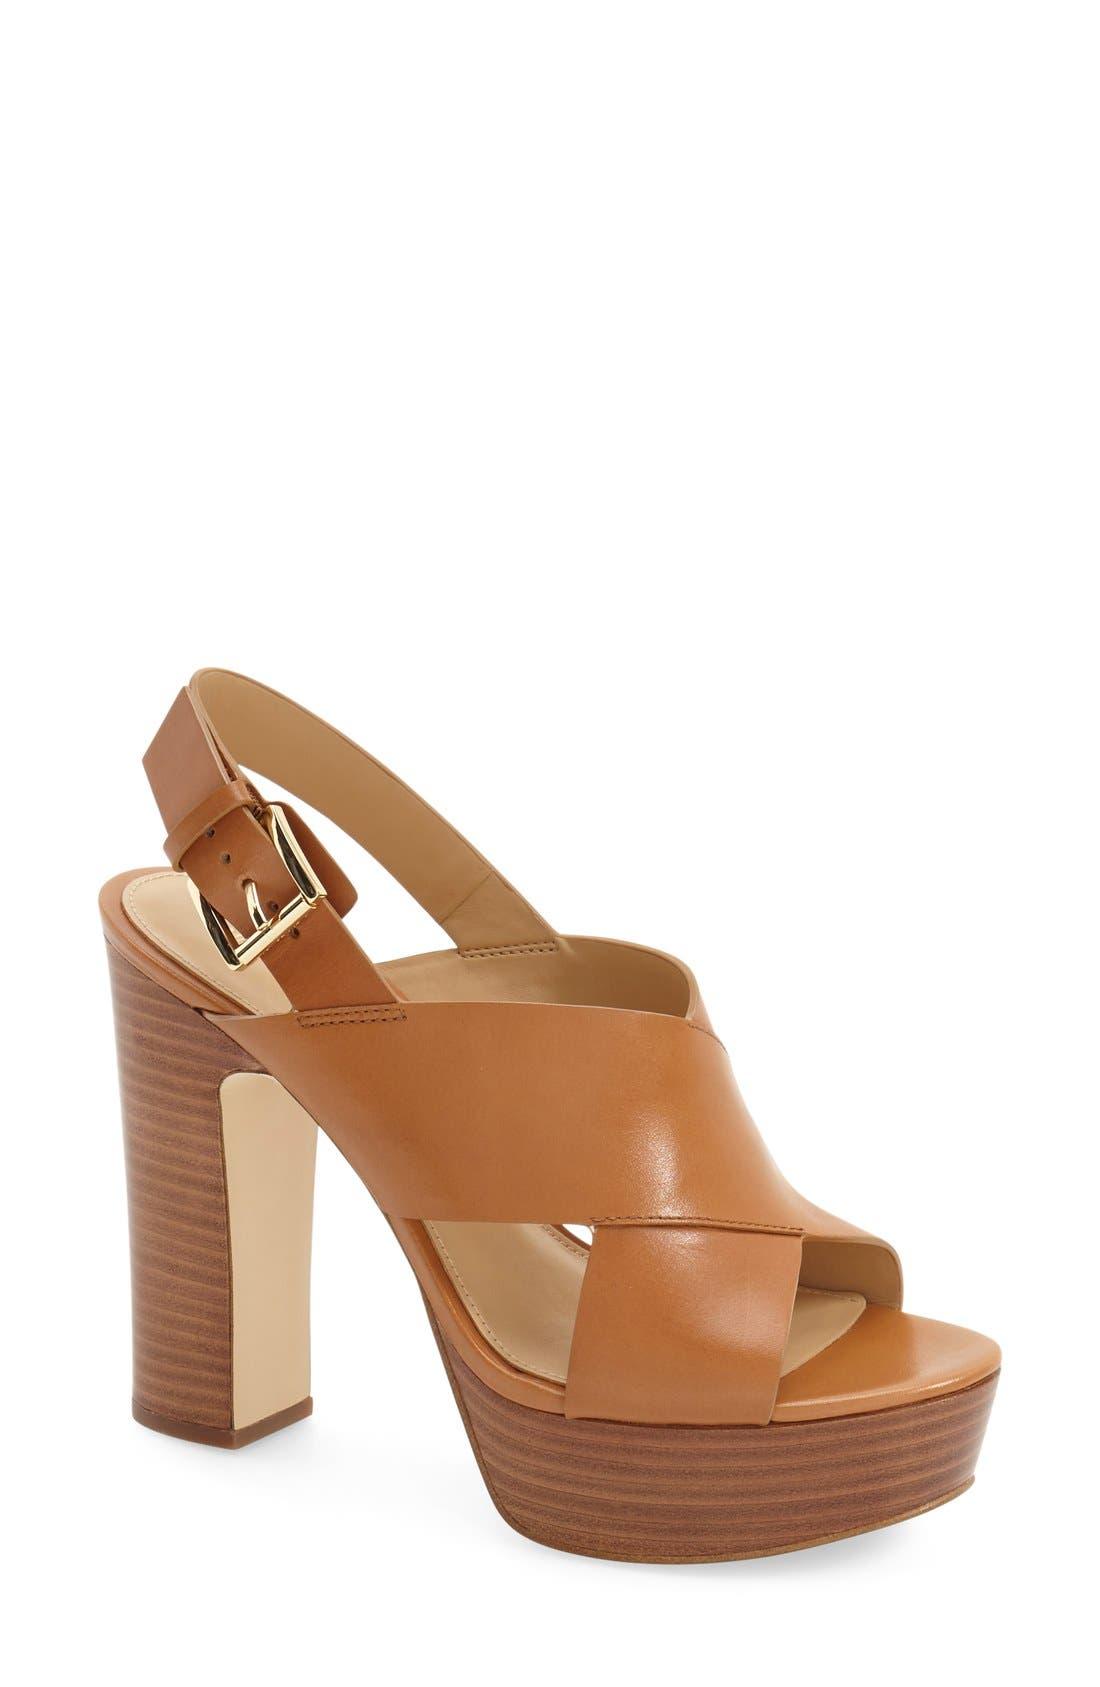 Main Image - MICHAEL Michael Kors 'Marina' Slingback Platform Sandal (Women)